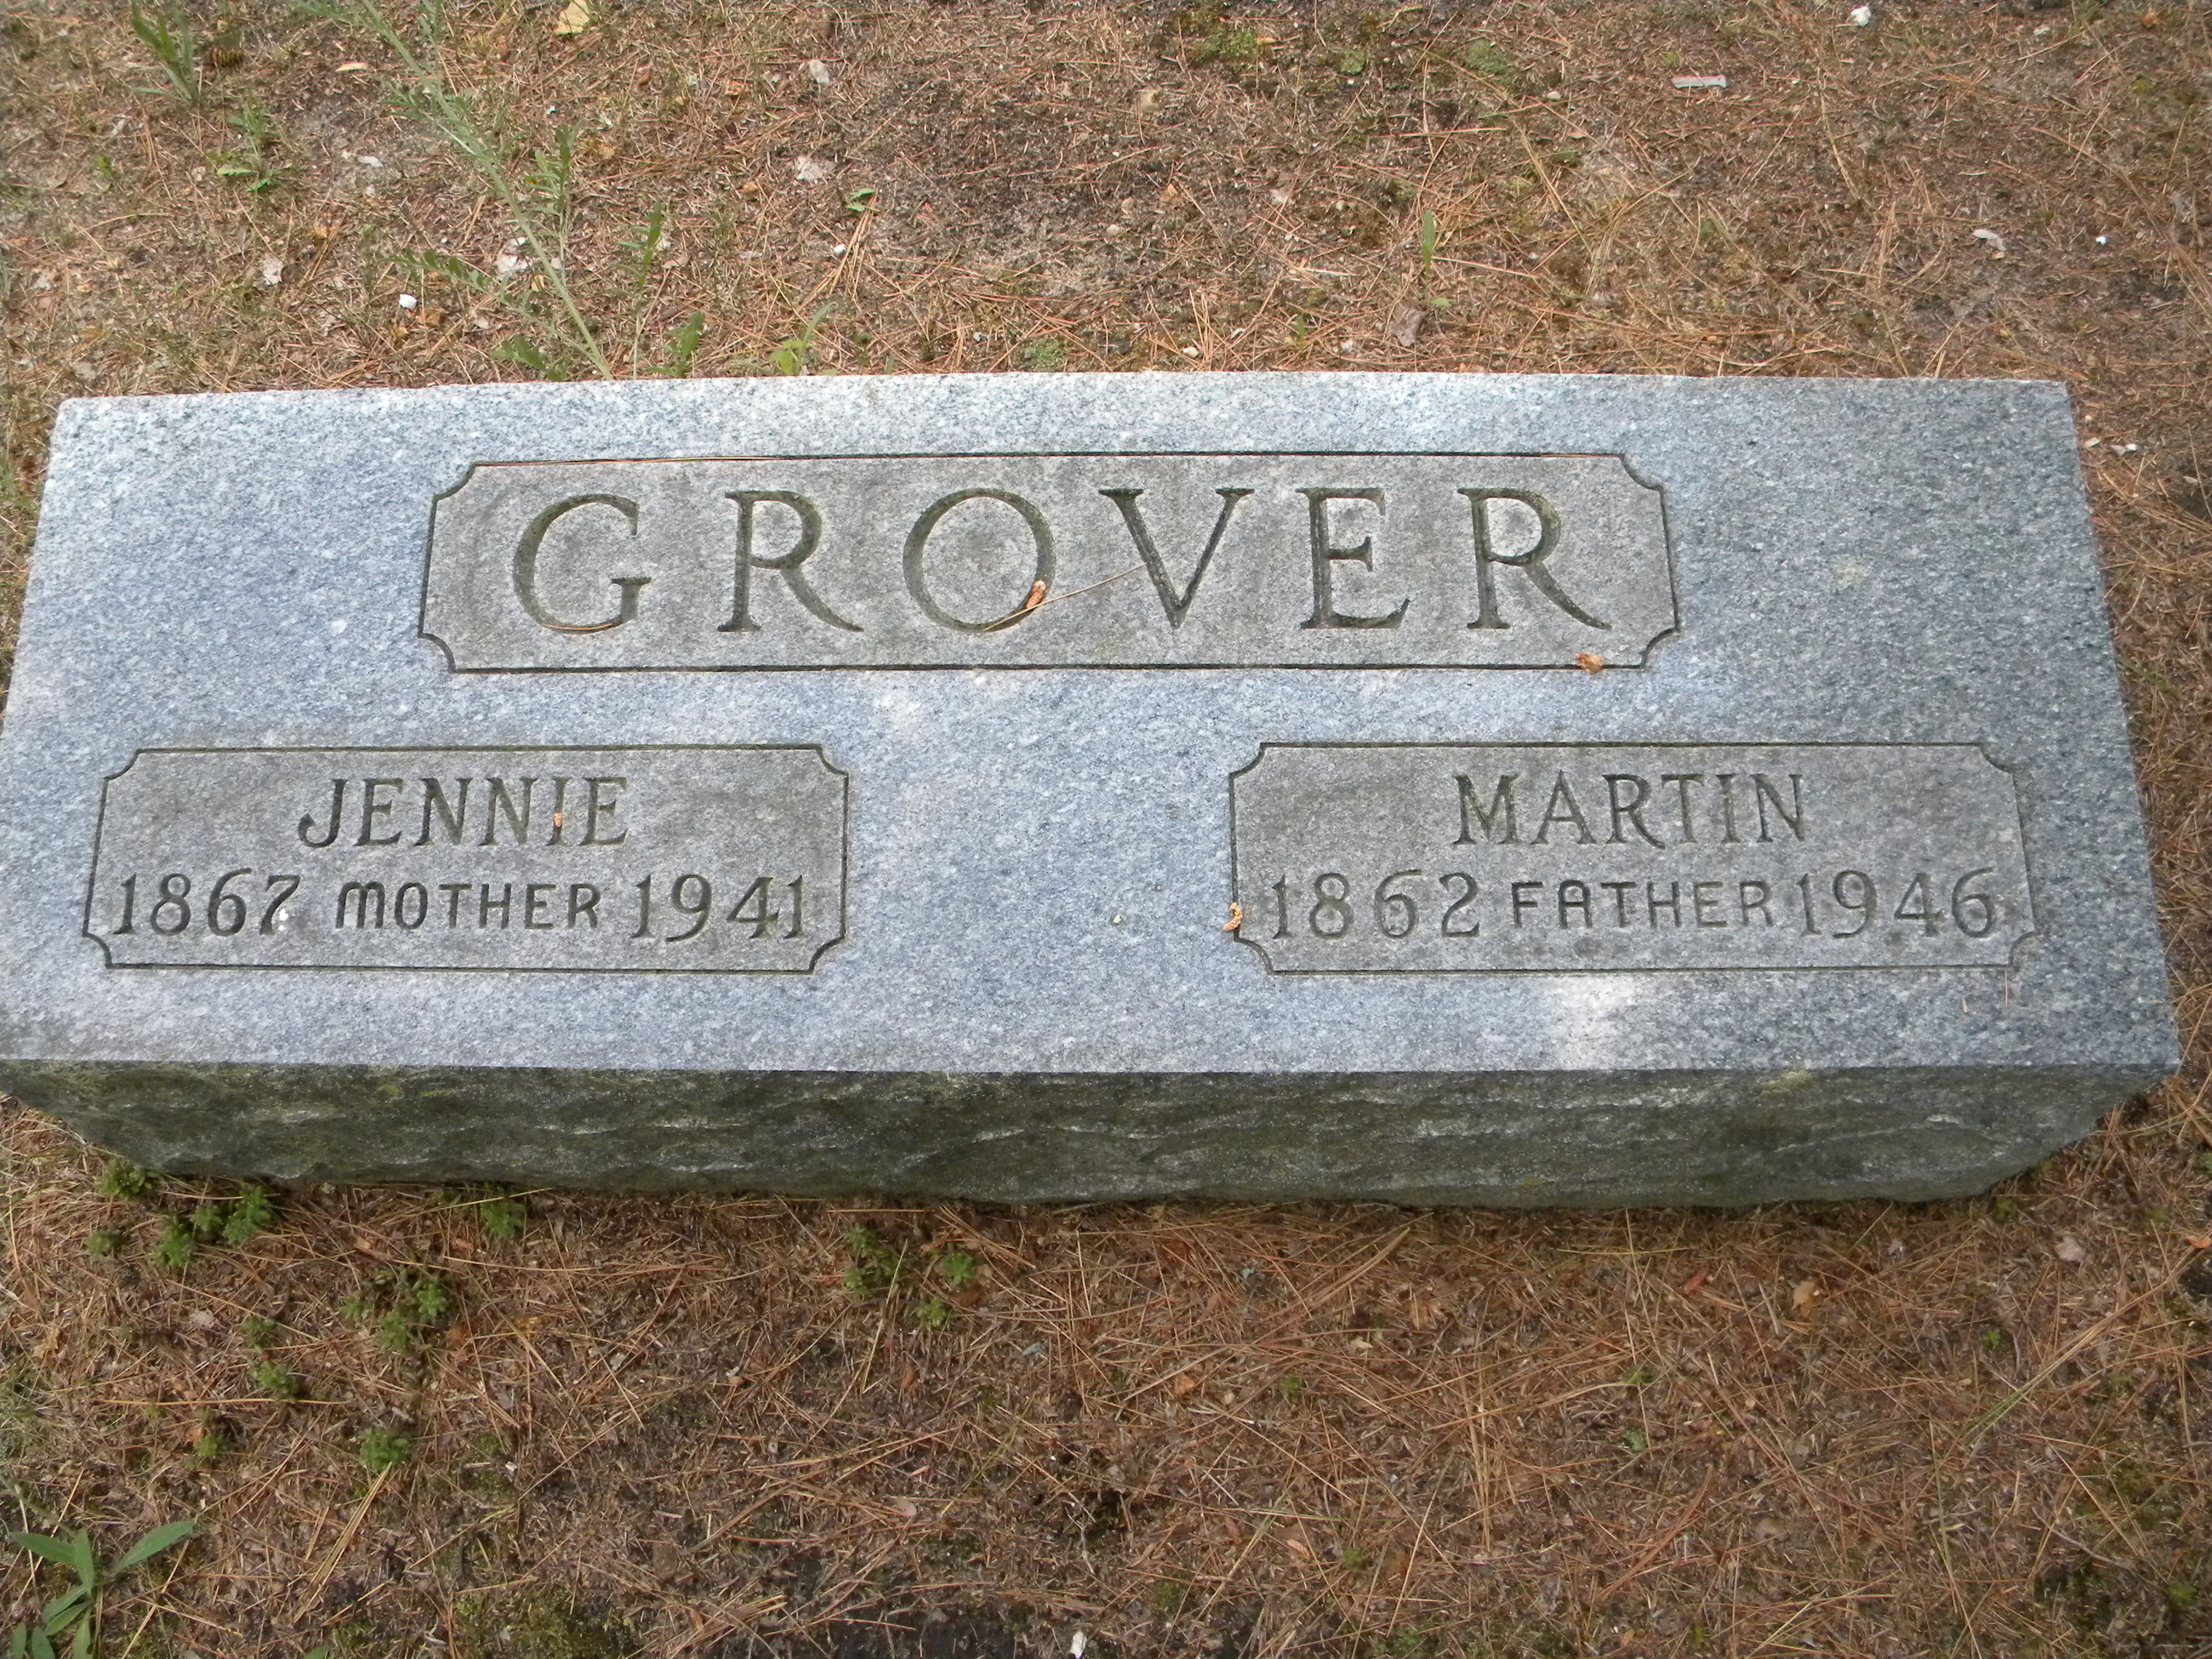 Martin M. Grover